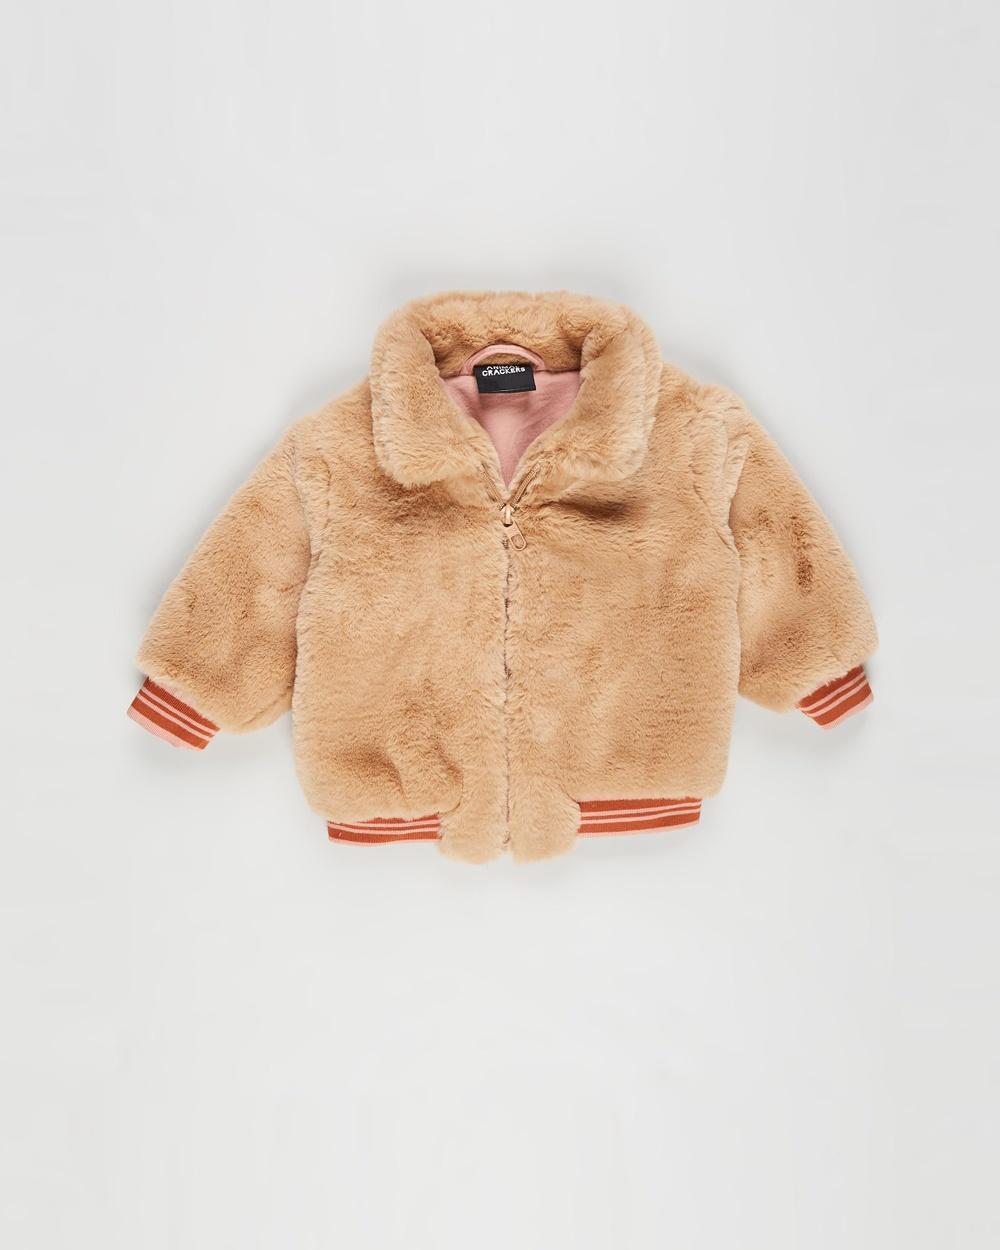 Animal Crackers Staple Jacket Babies Coats & Jackets Tan